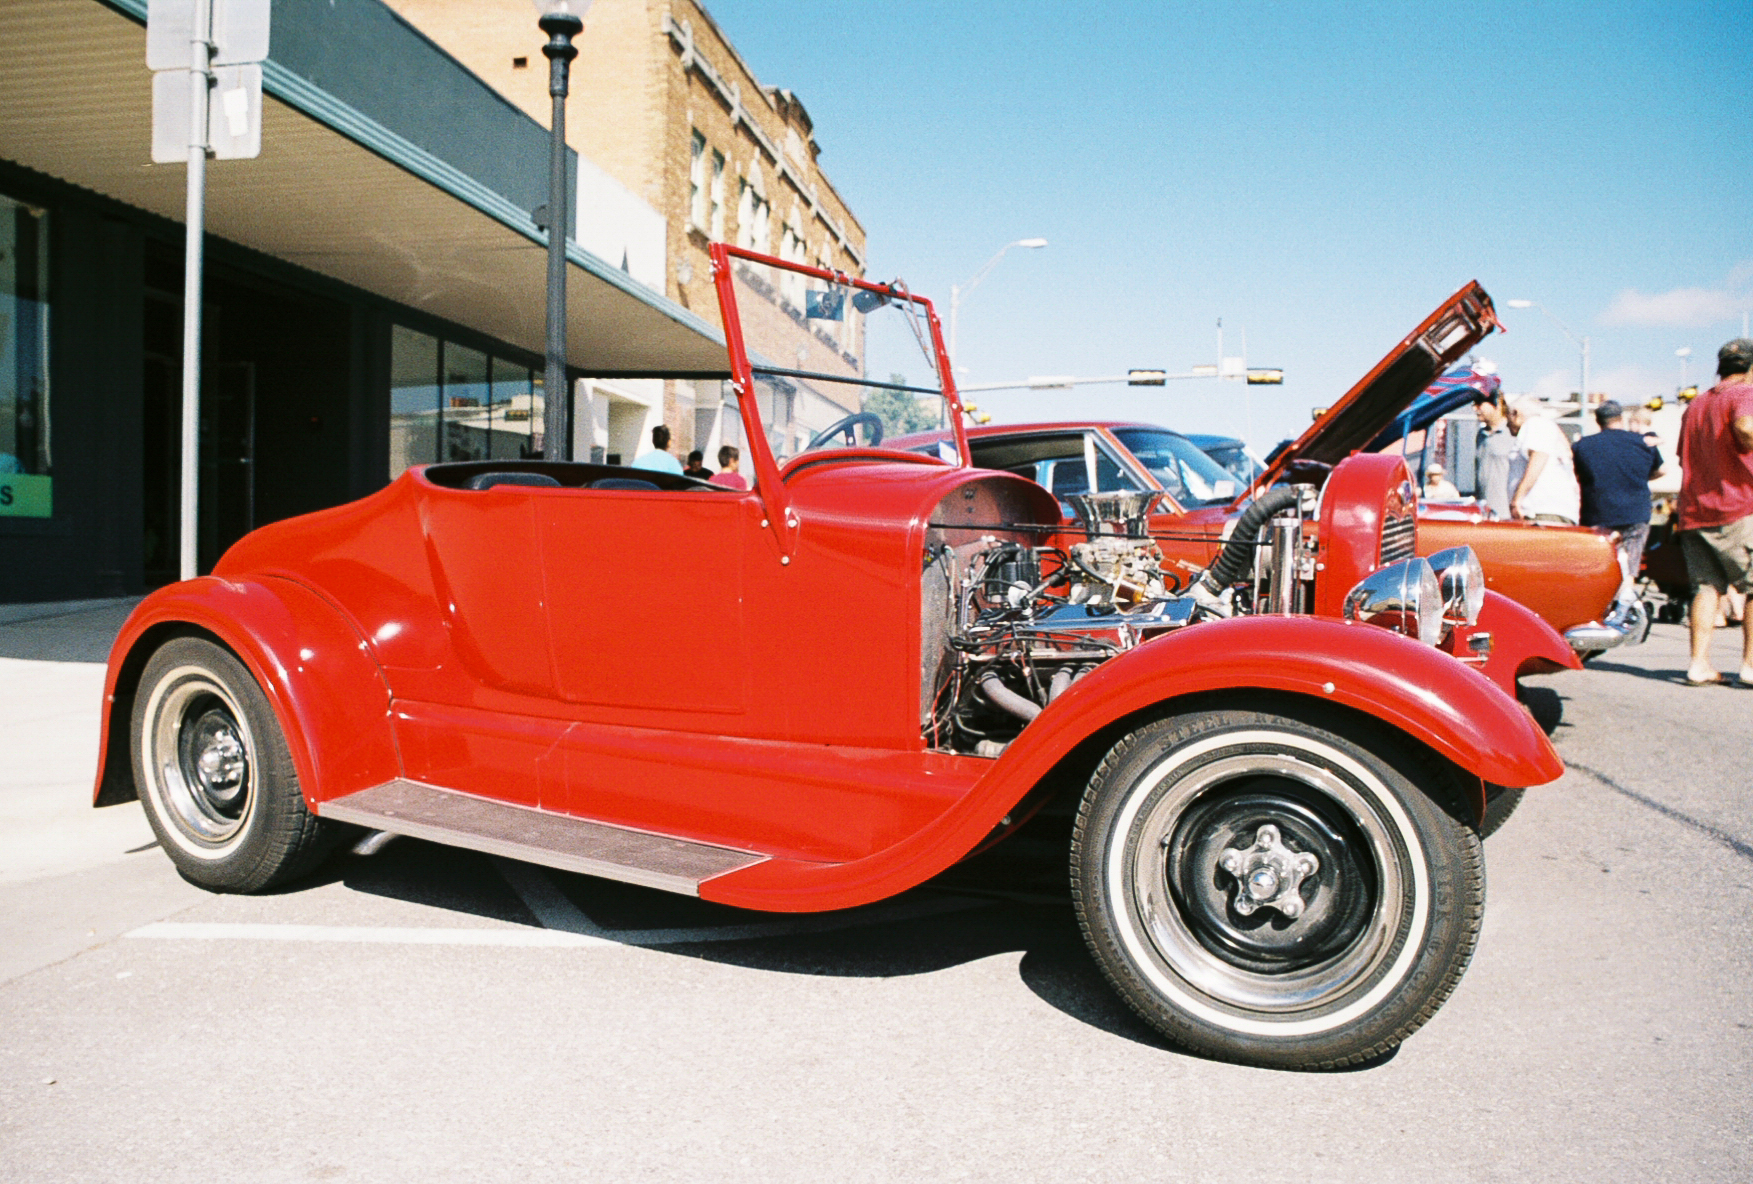 taylor-main-street-car-show-2016-4.jpg